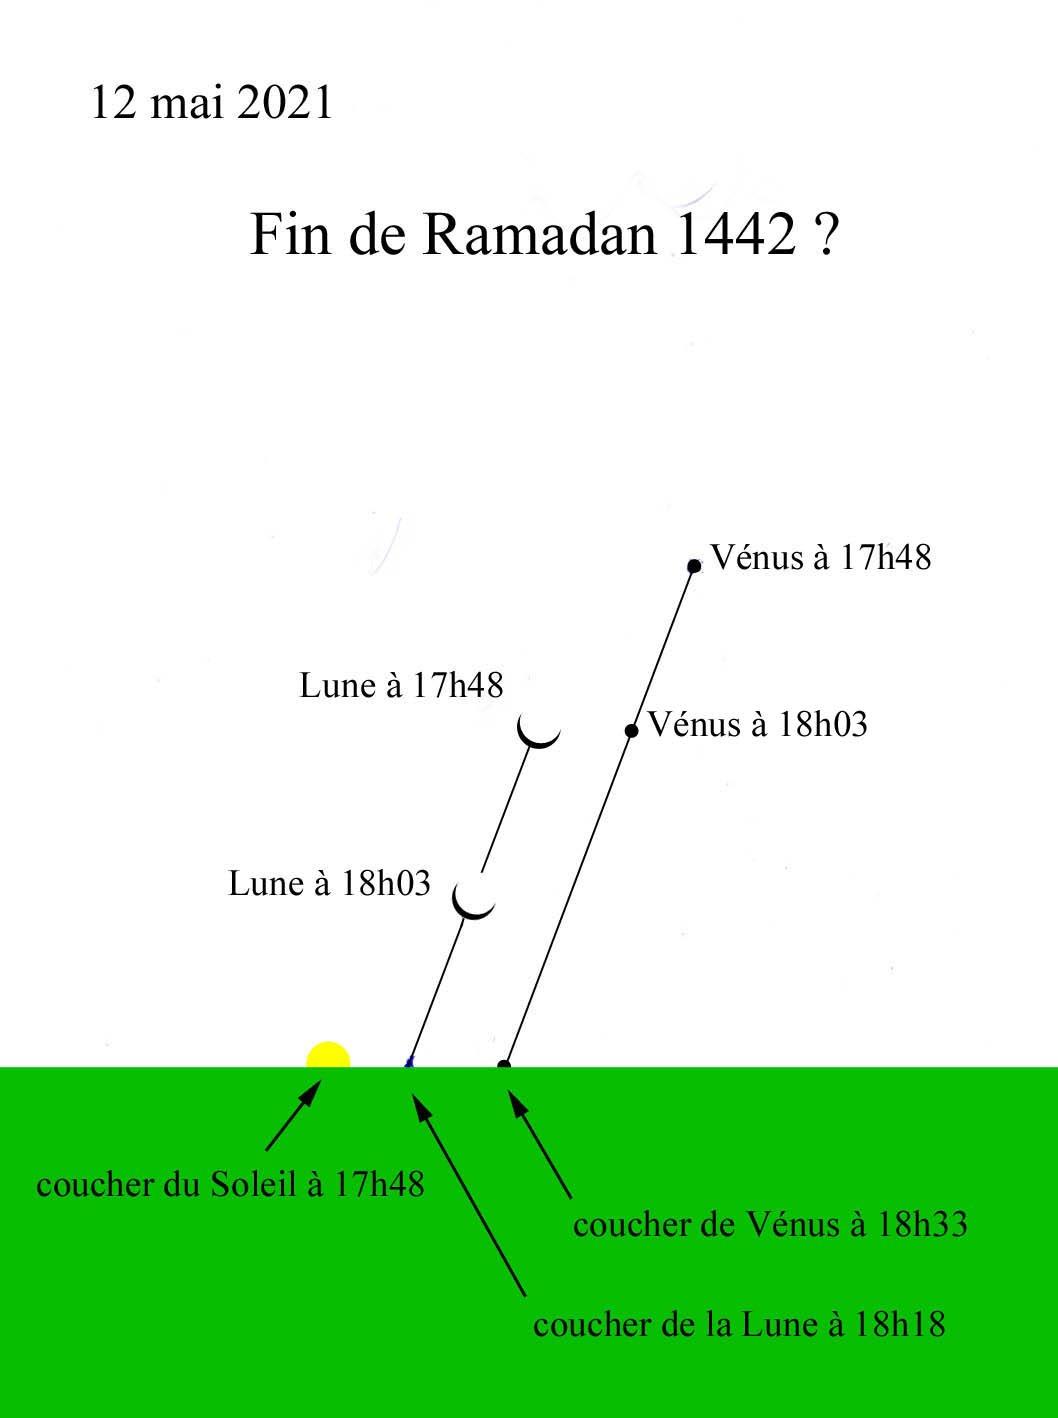 Fin Ramadan?